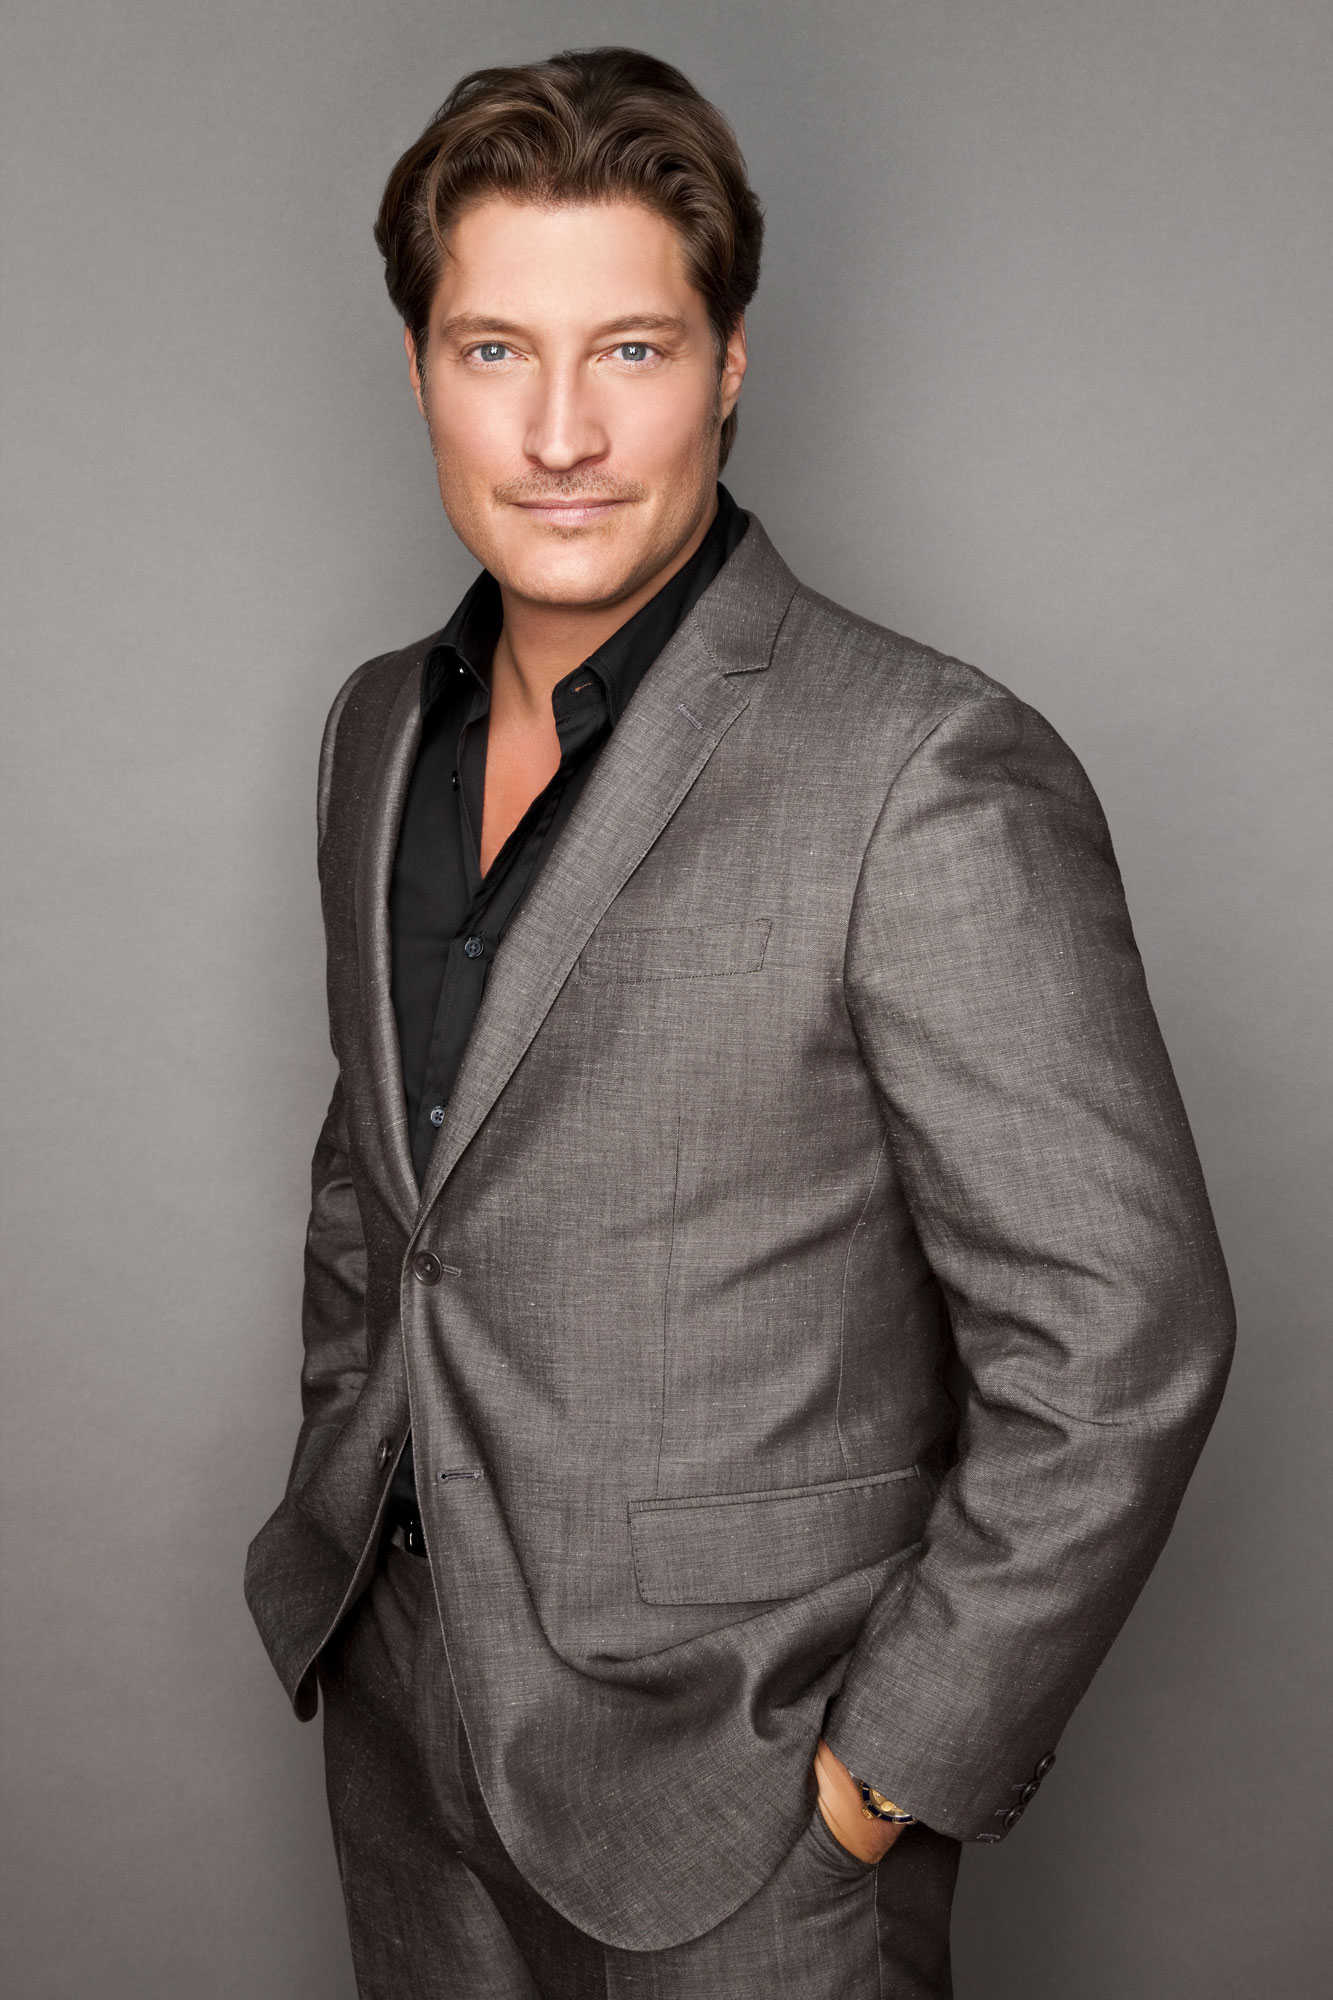 Deacon Sharpe (Sean Kanan)